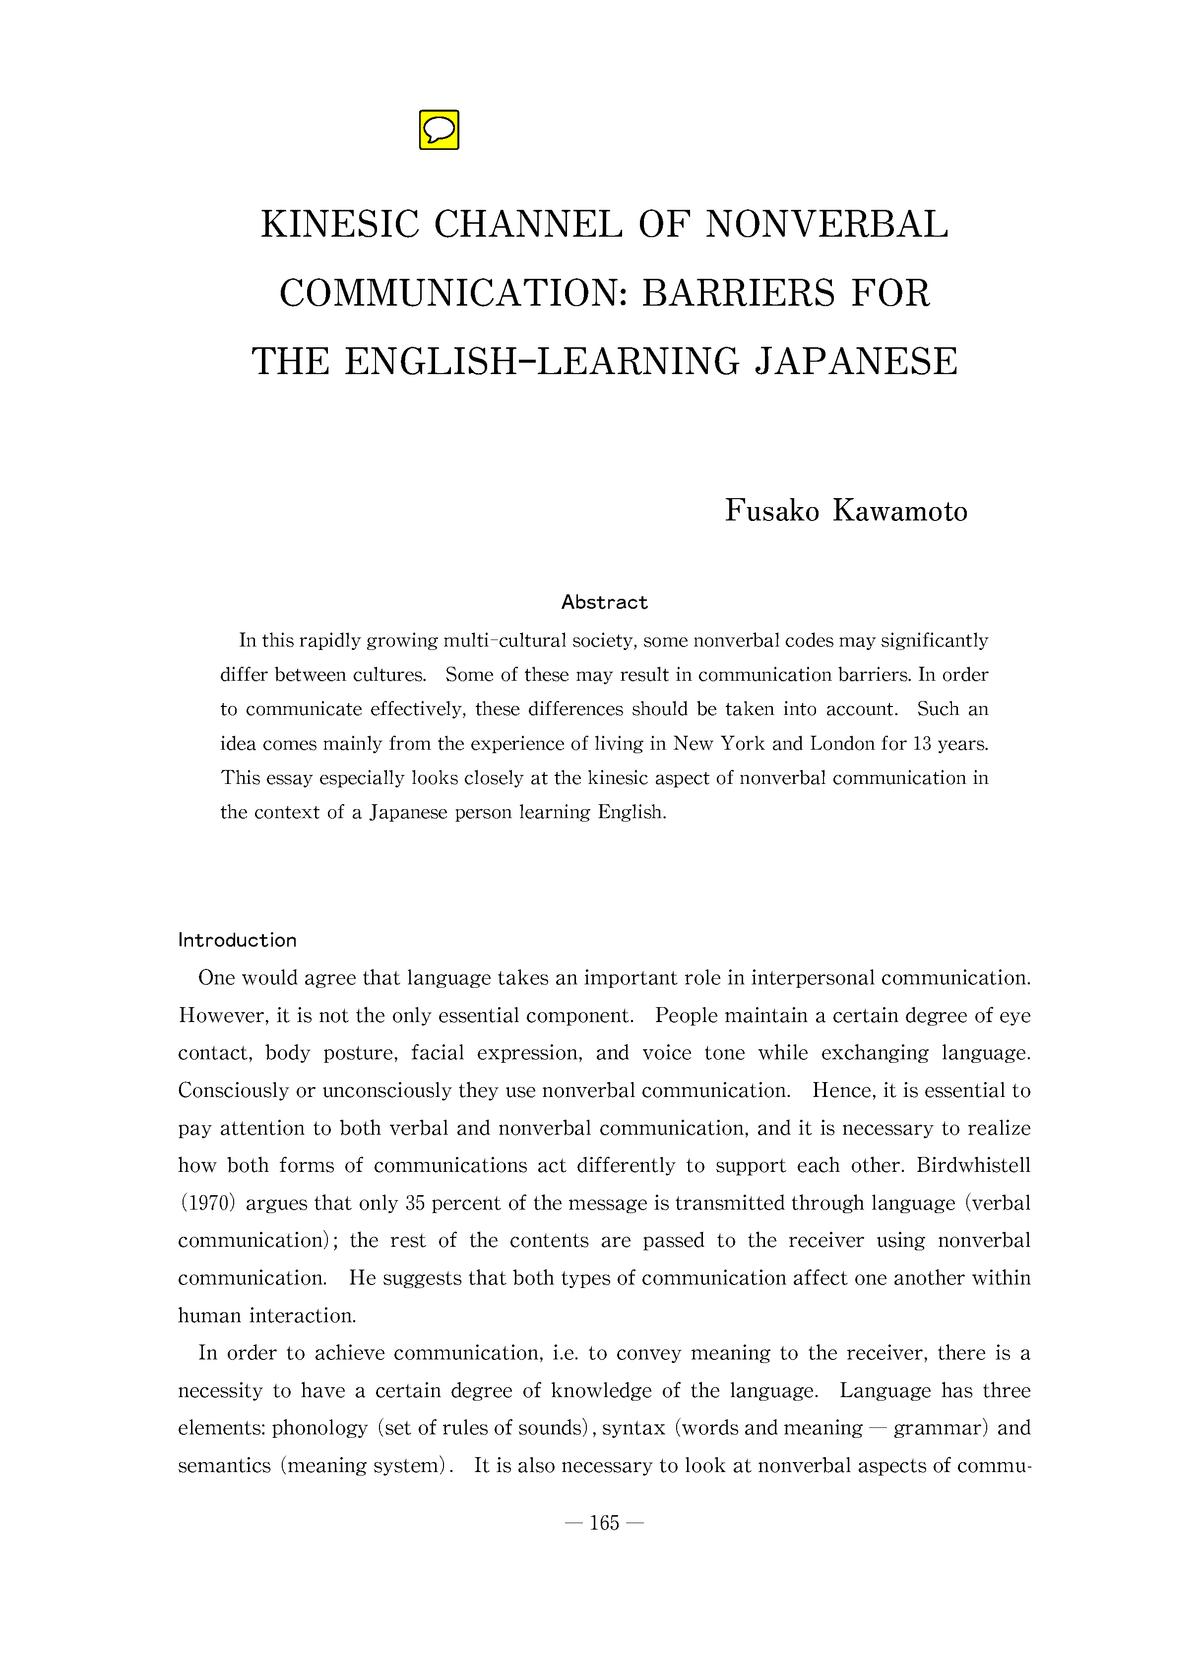 nonverbal communication essay free